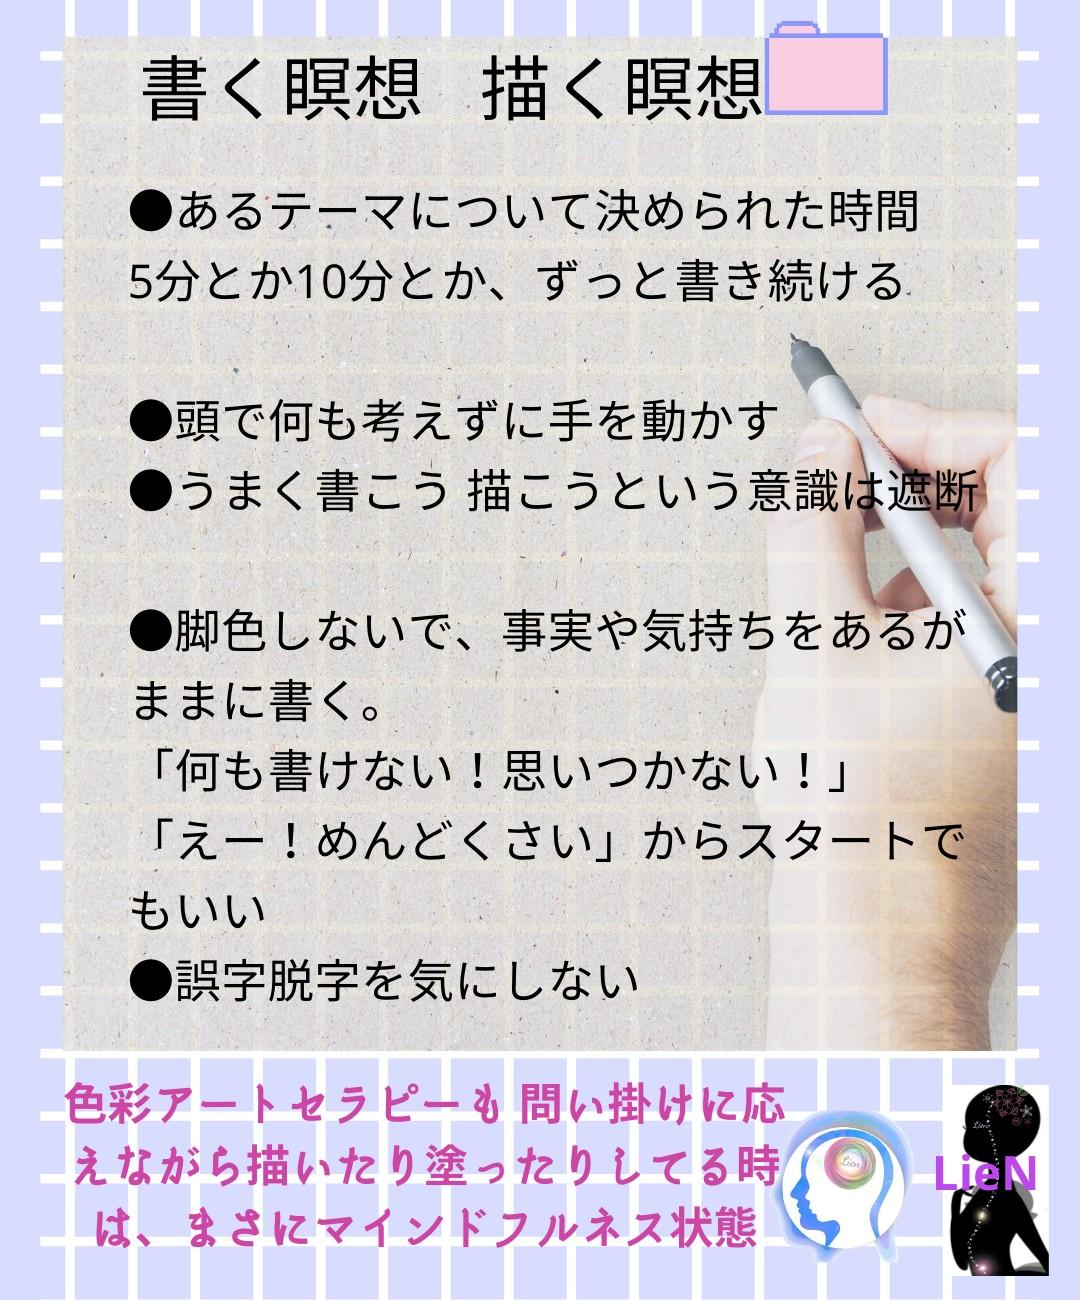 f:id:yuyu-s:20200211170156j:image